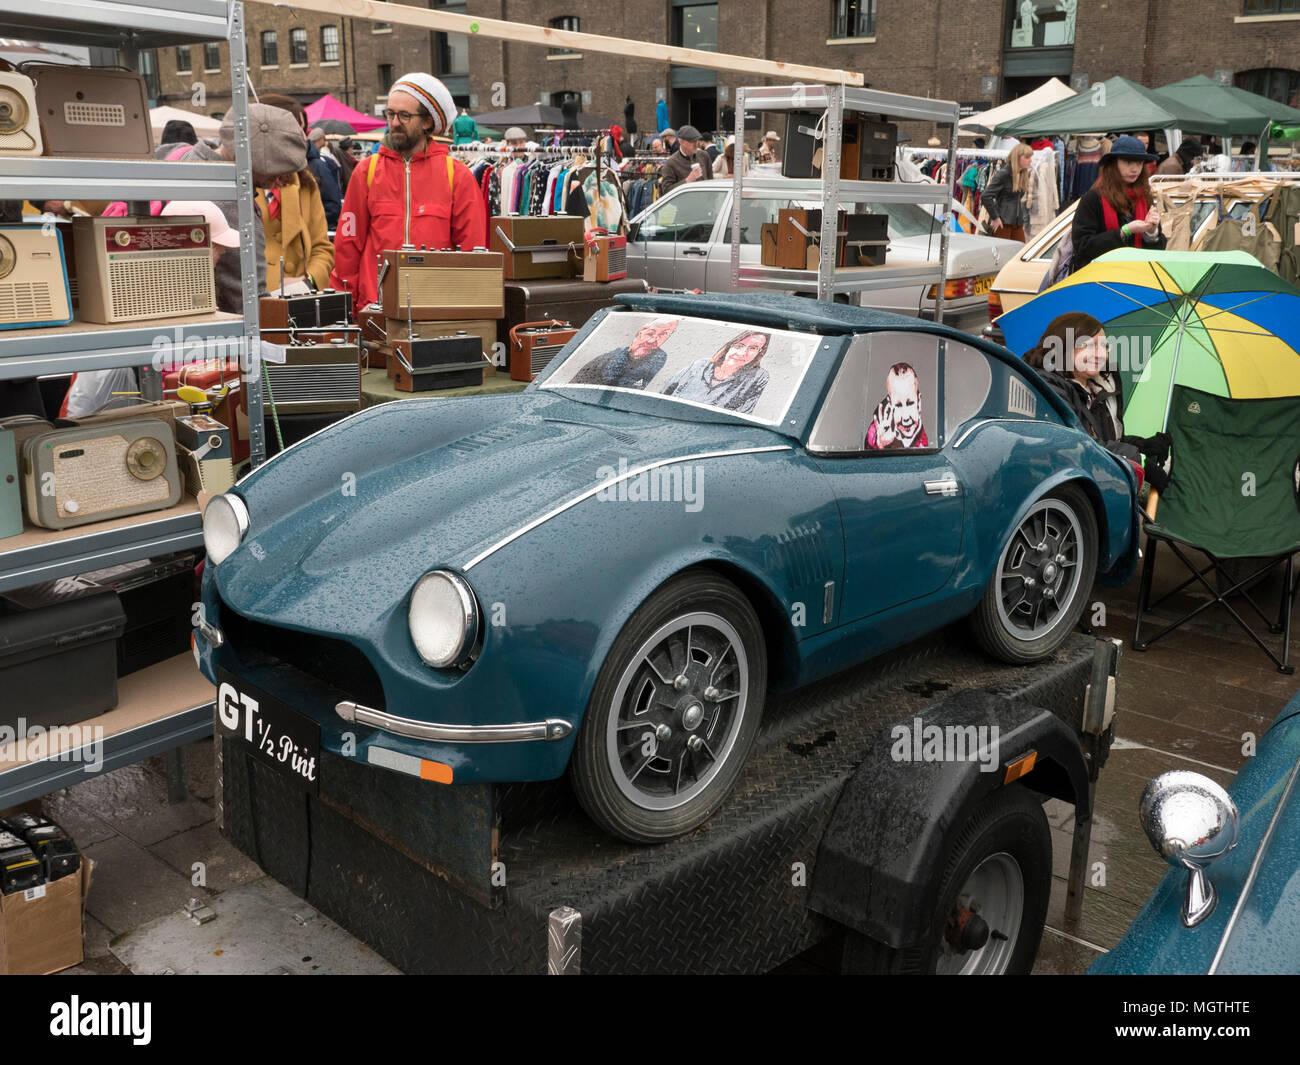 london, uk. 28 april 2018. the classic car boot sale in granary sq